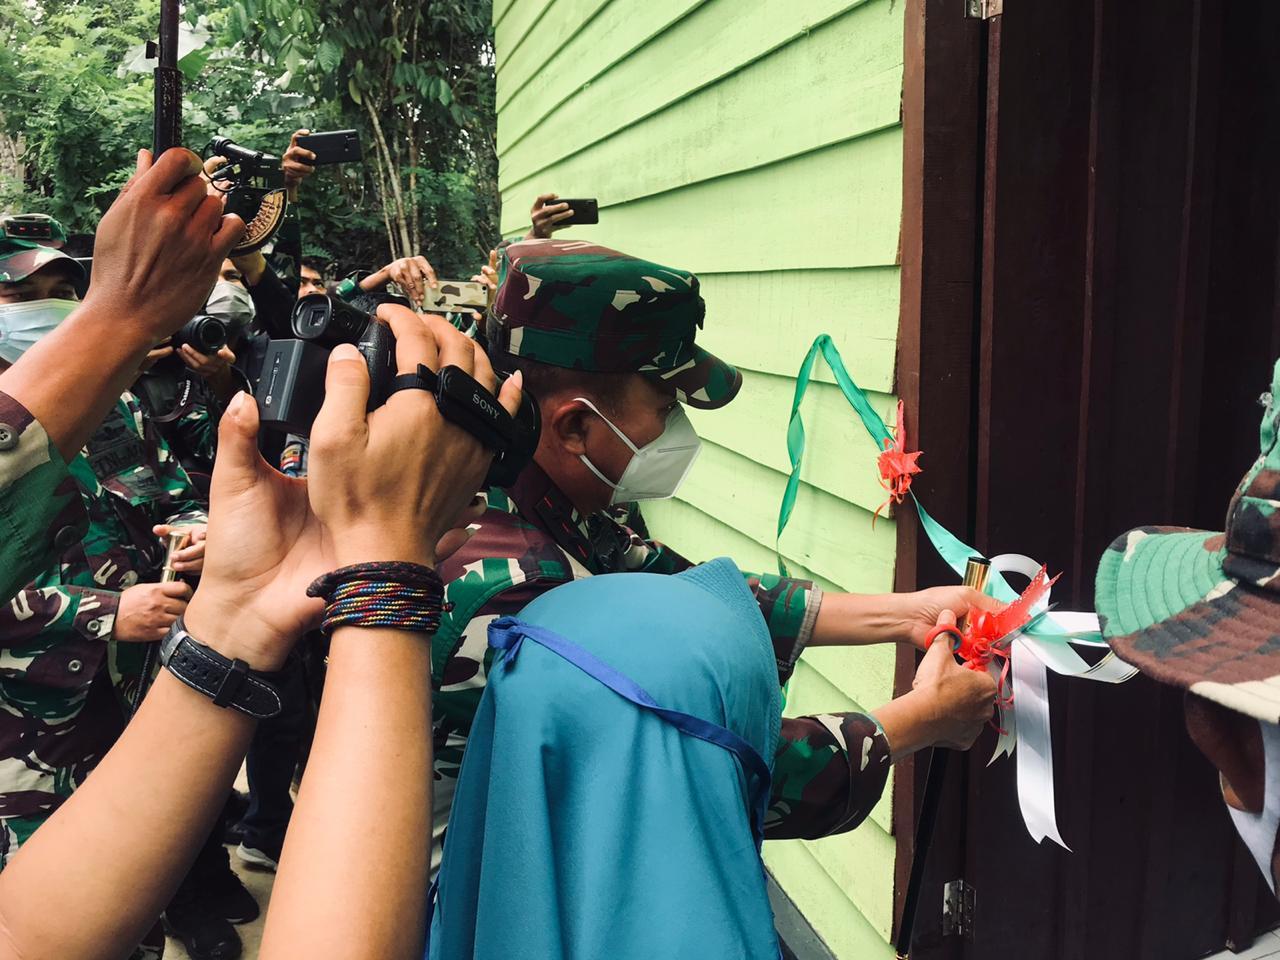 Pangdam Hasanuddin Resmikan Masjid dan Rumah Hasil Karya Bakti TNI 2020